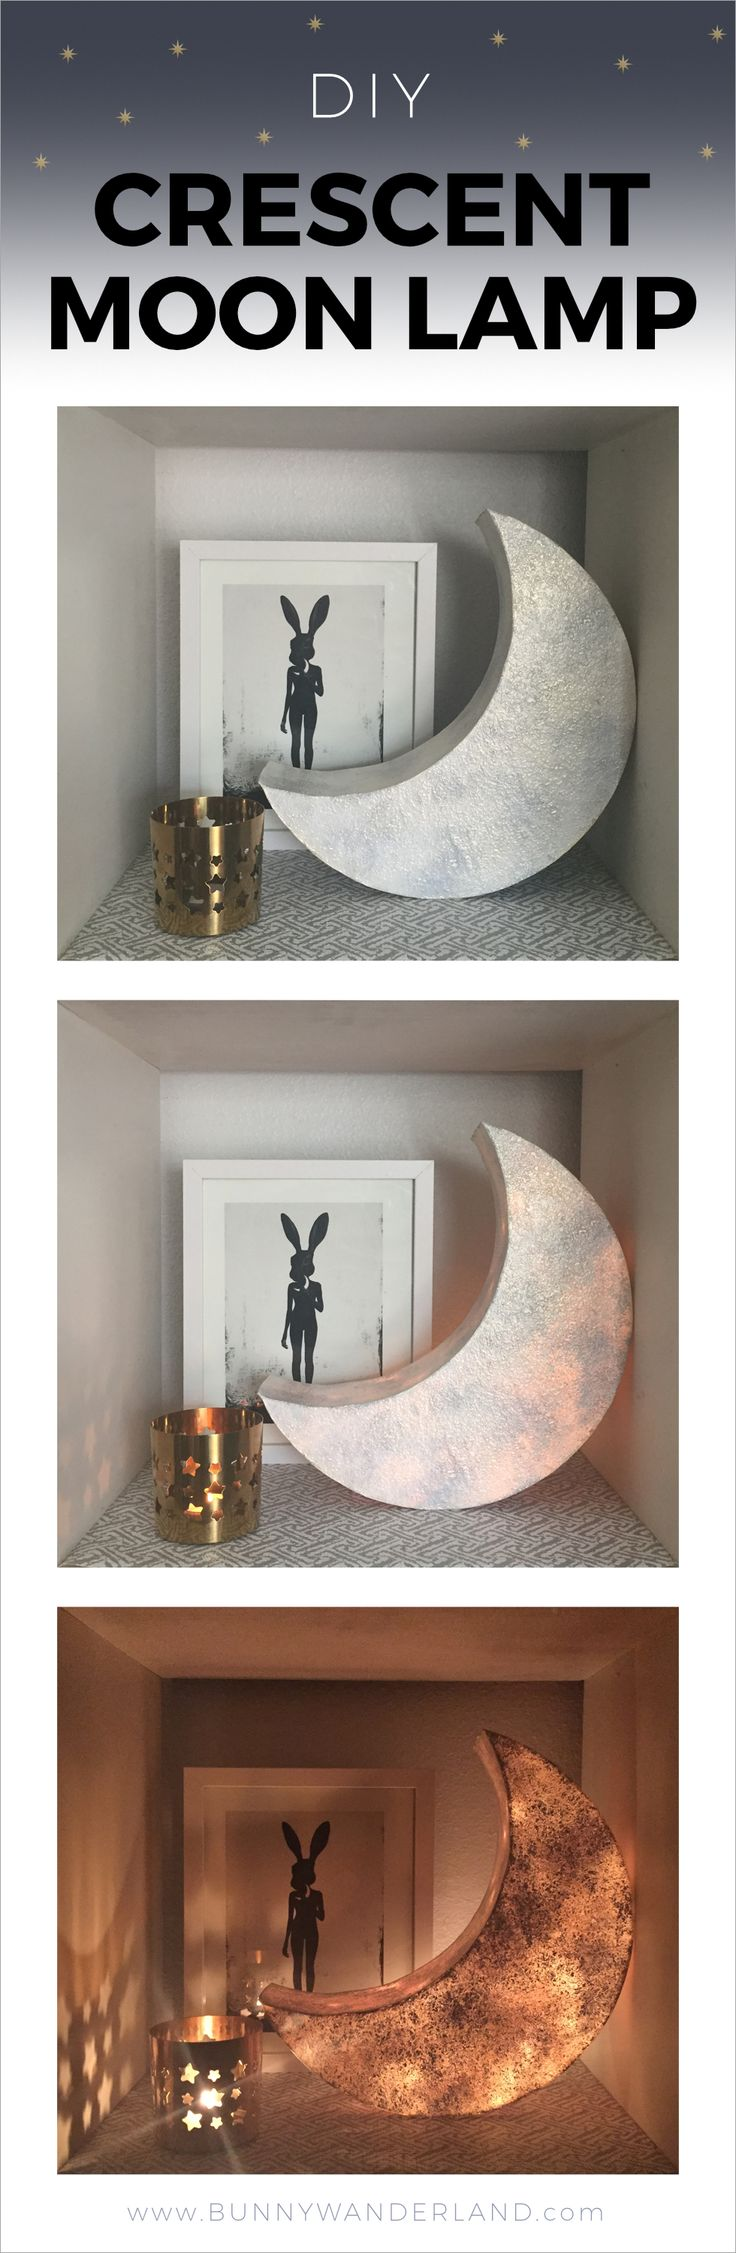 http://bunnywanderland.com | DIY Crescent Moon Lamp